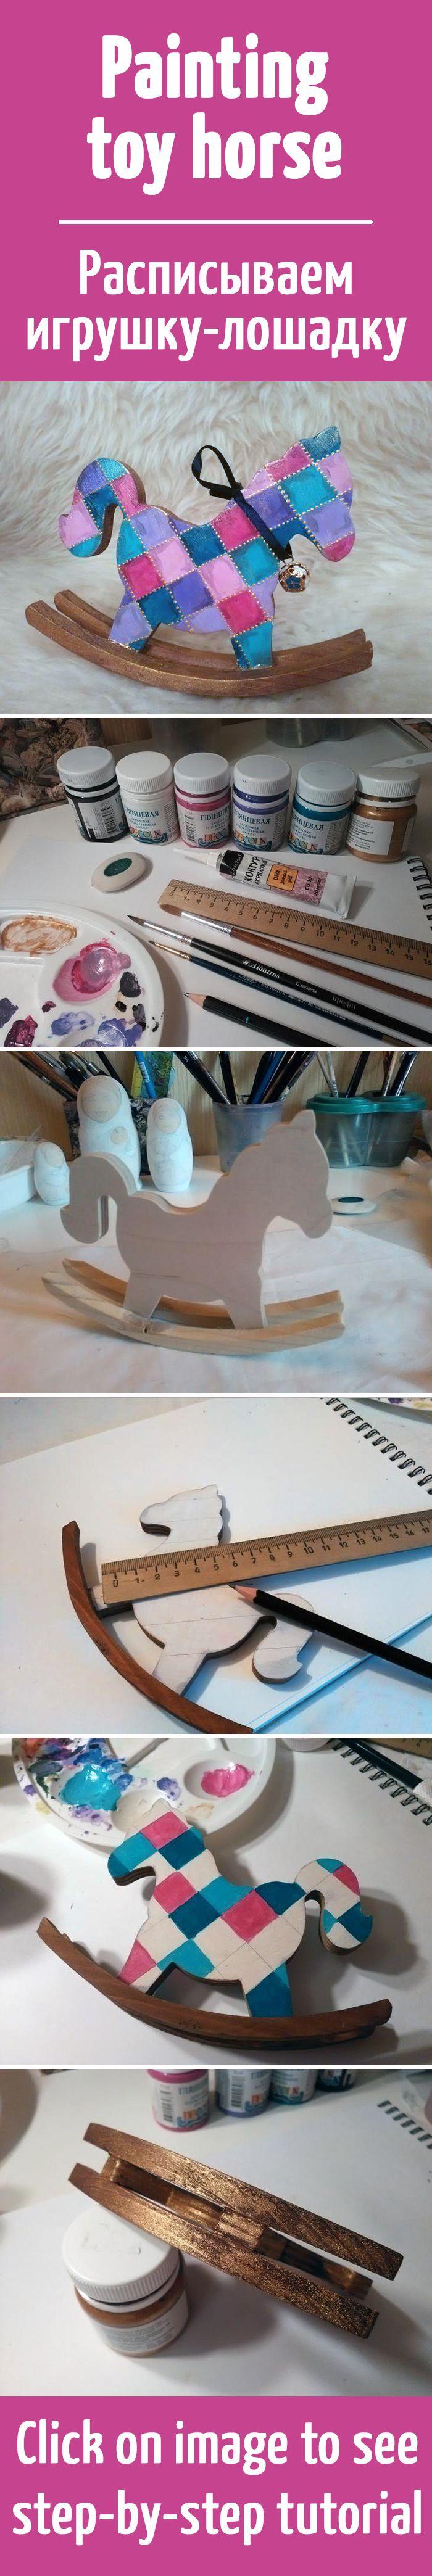 Мастер-класс: расписываем игрушку-лошадку / Painting toy horse tutorial #diy #painting #tutorial